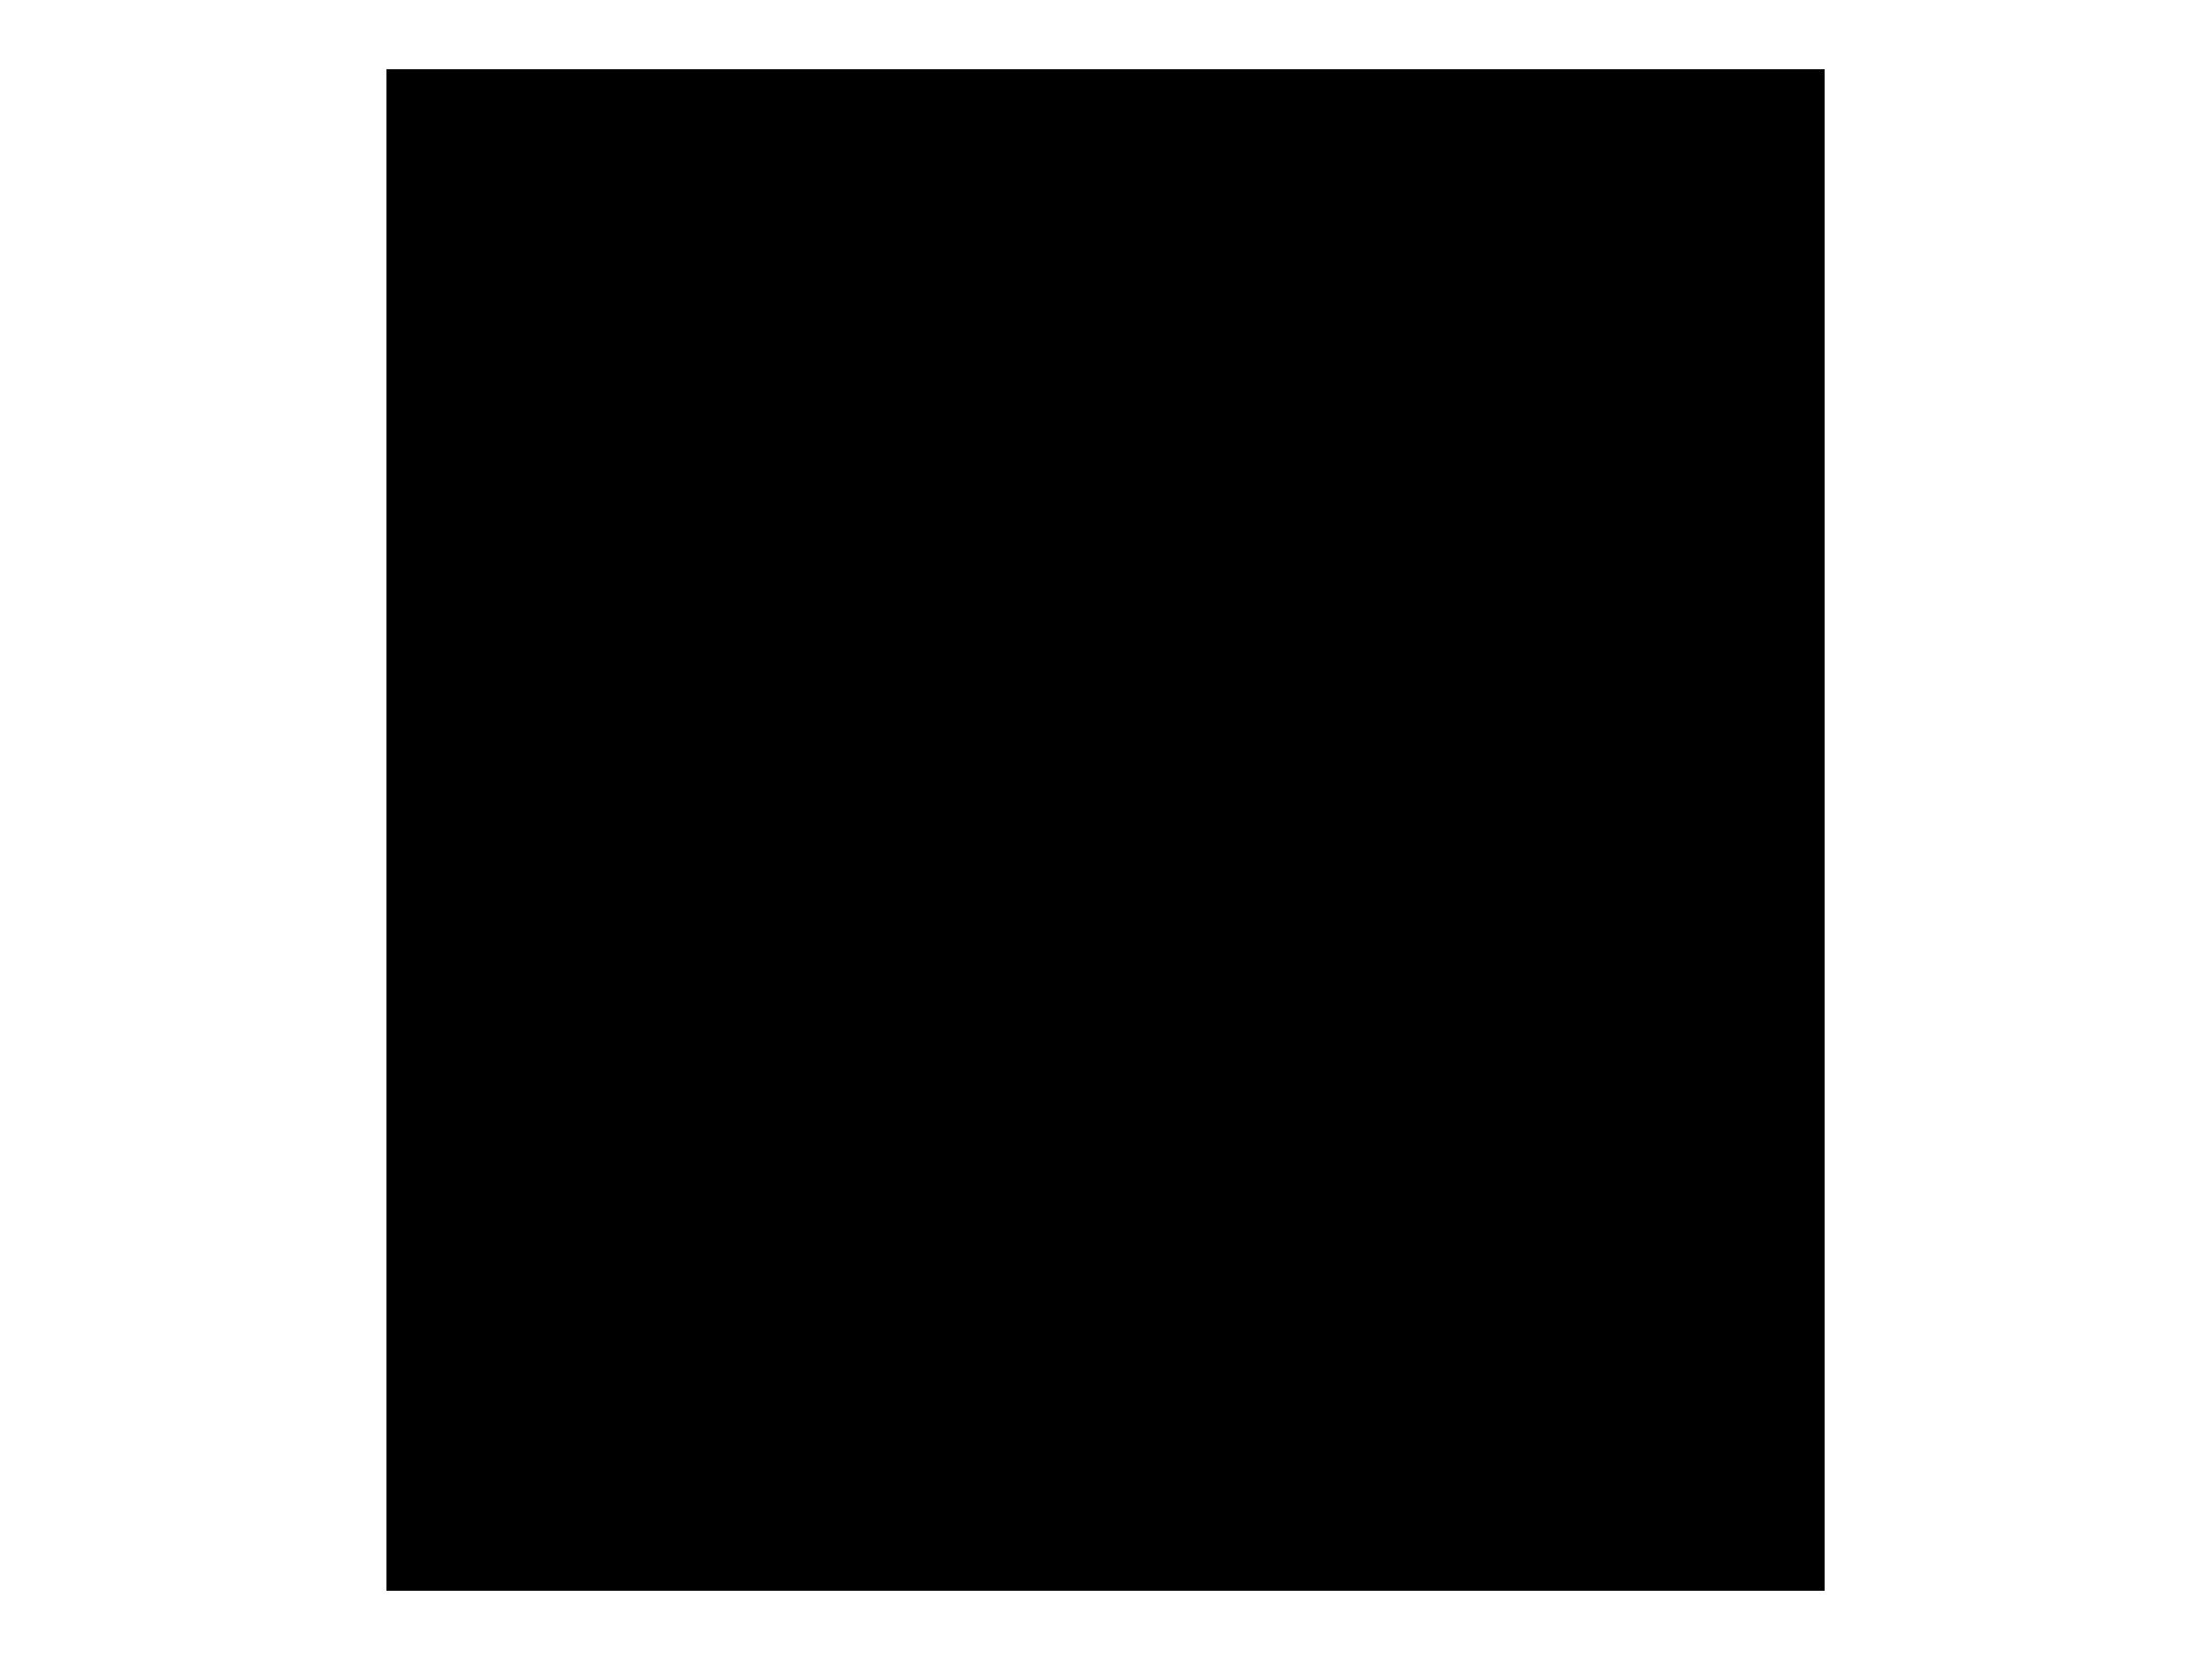 kendra-scott.png